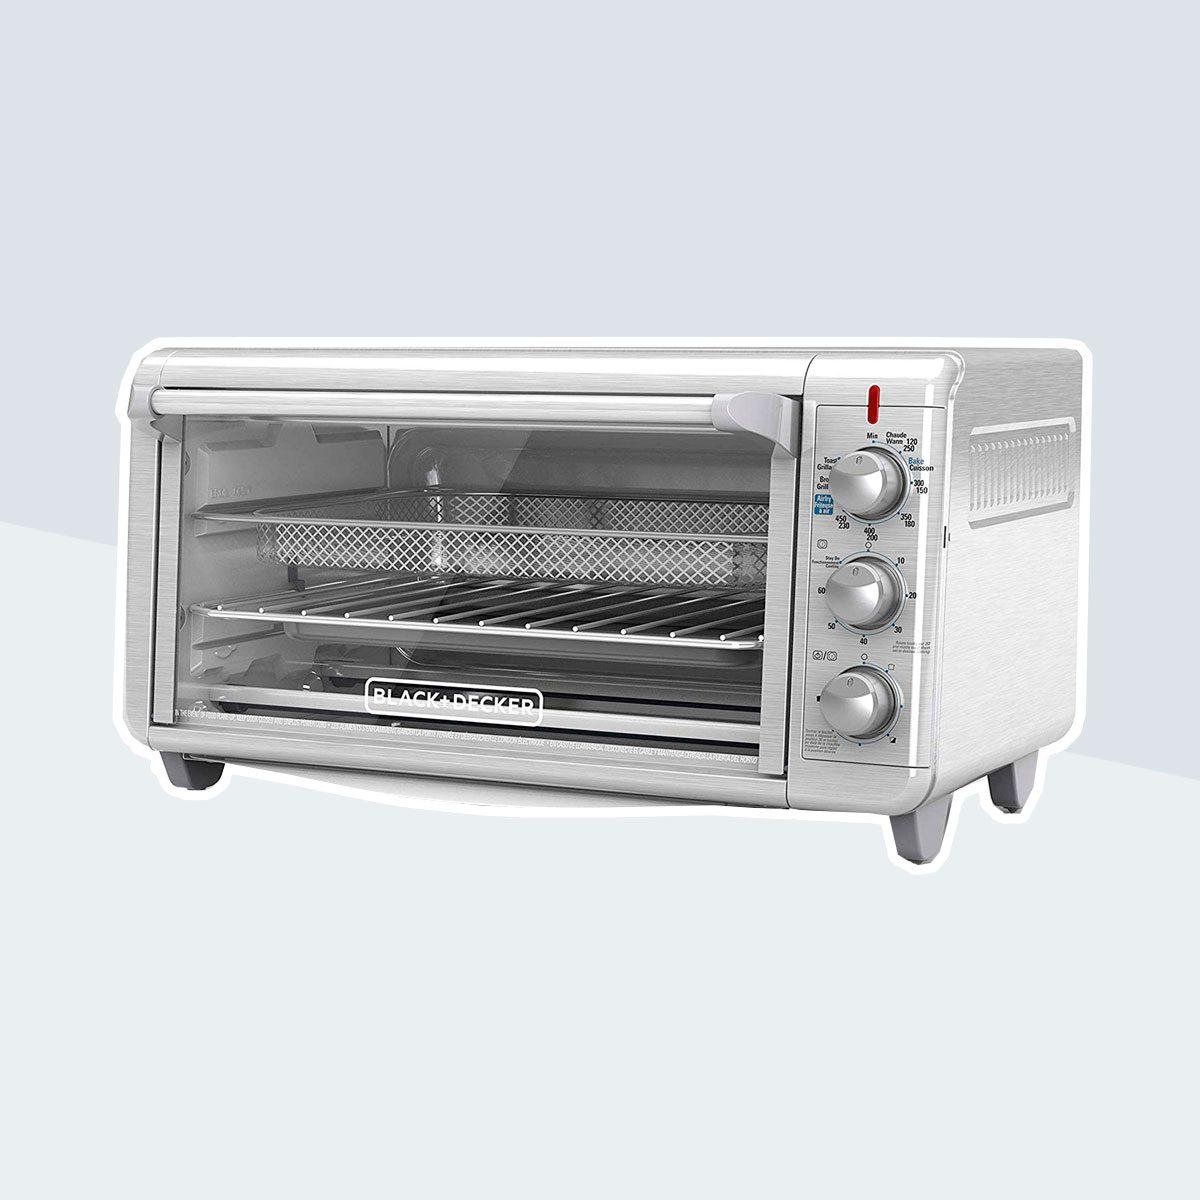 Black + Decker Crisp and Bake Air Fry Digital Convection Toaster Oven